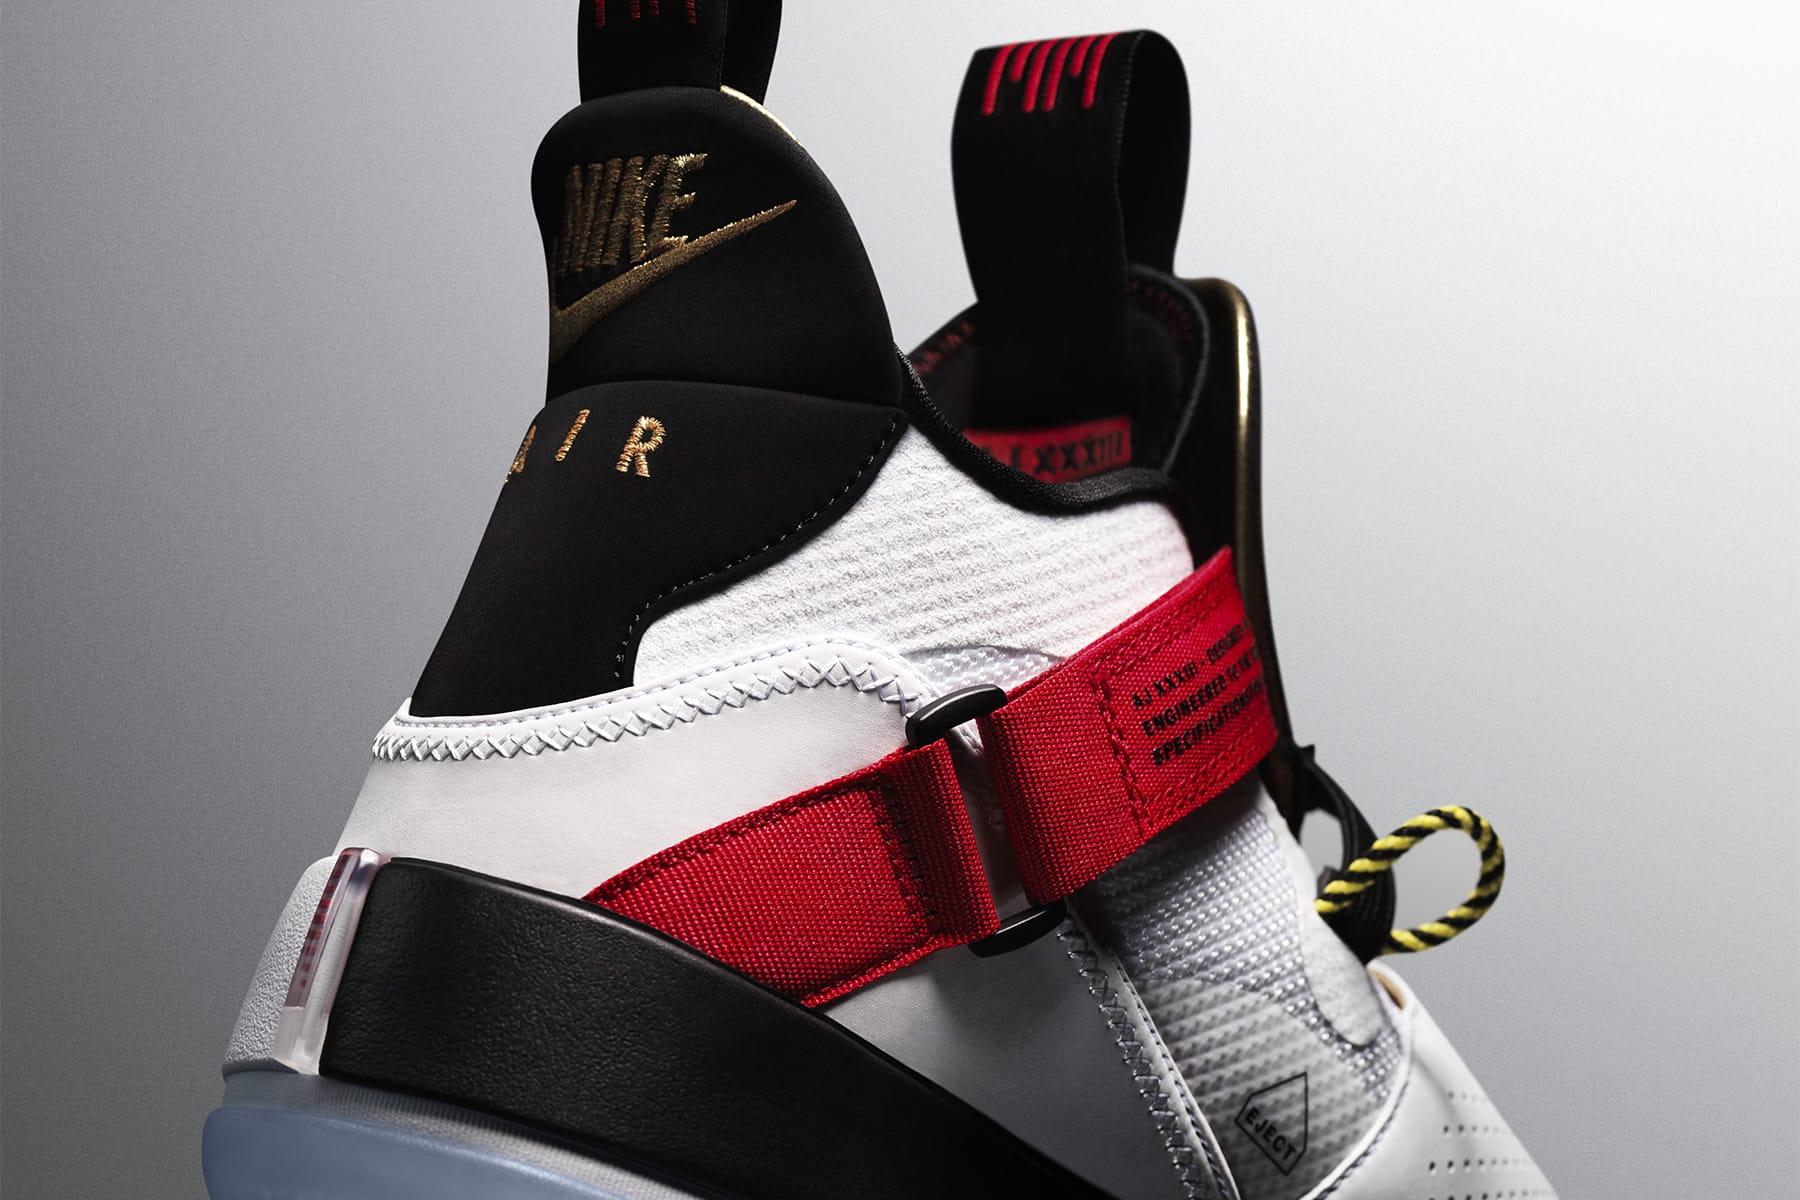 ec2291ad013f79 Jordan Brand debuts Air Jordan 33 - its first laceless basketball ...